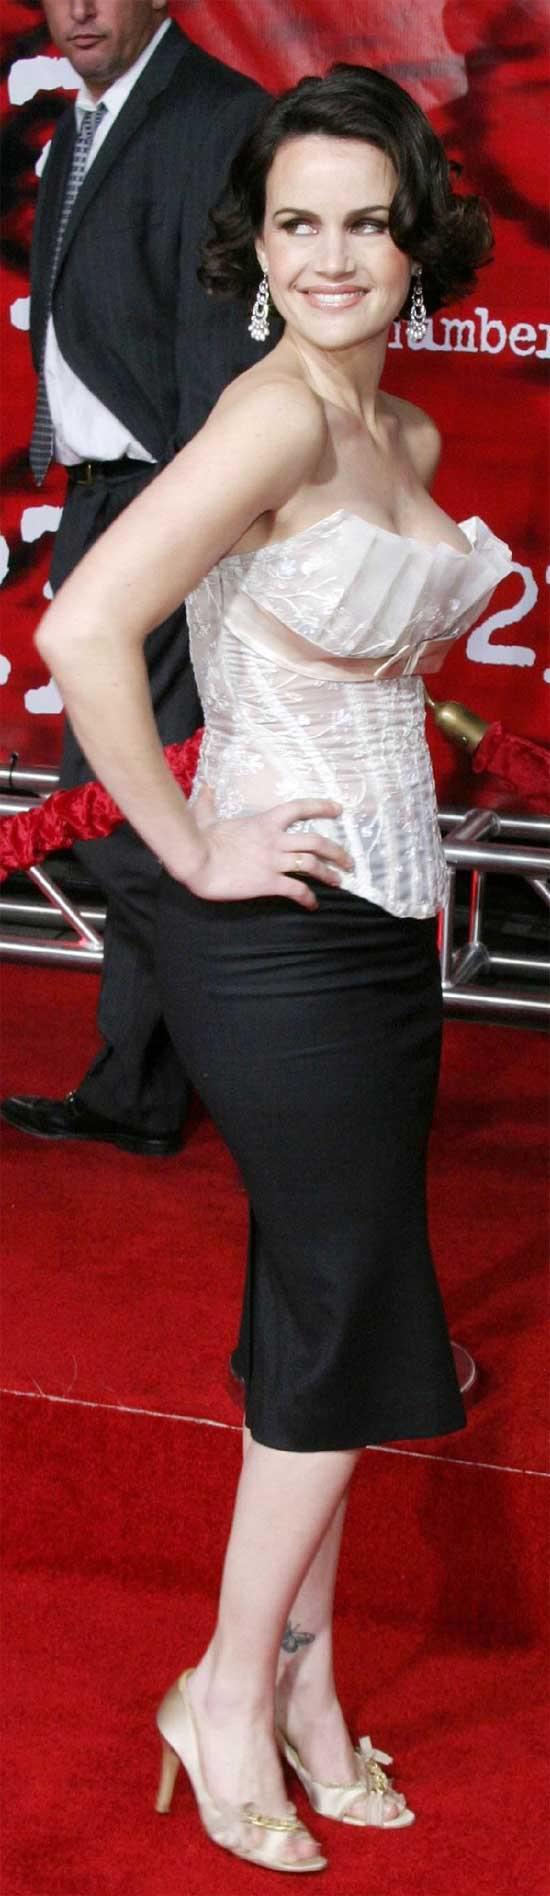 The Hottest Carla Gugino Photos - 12thBlog